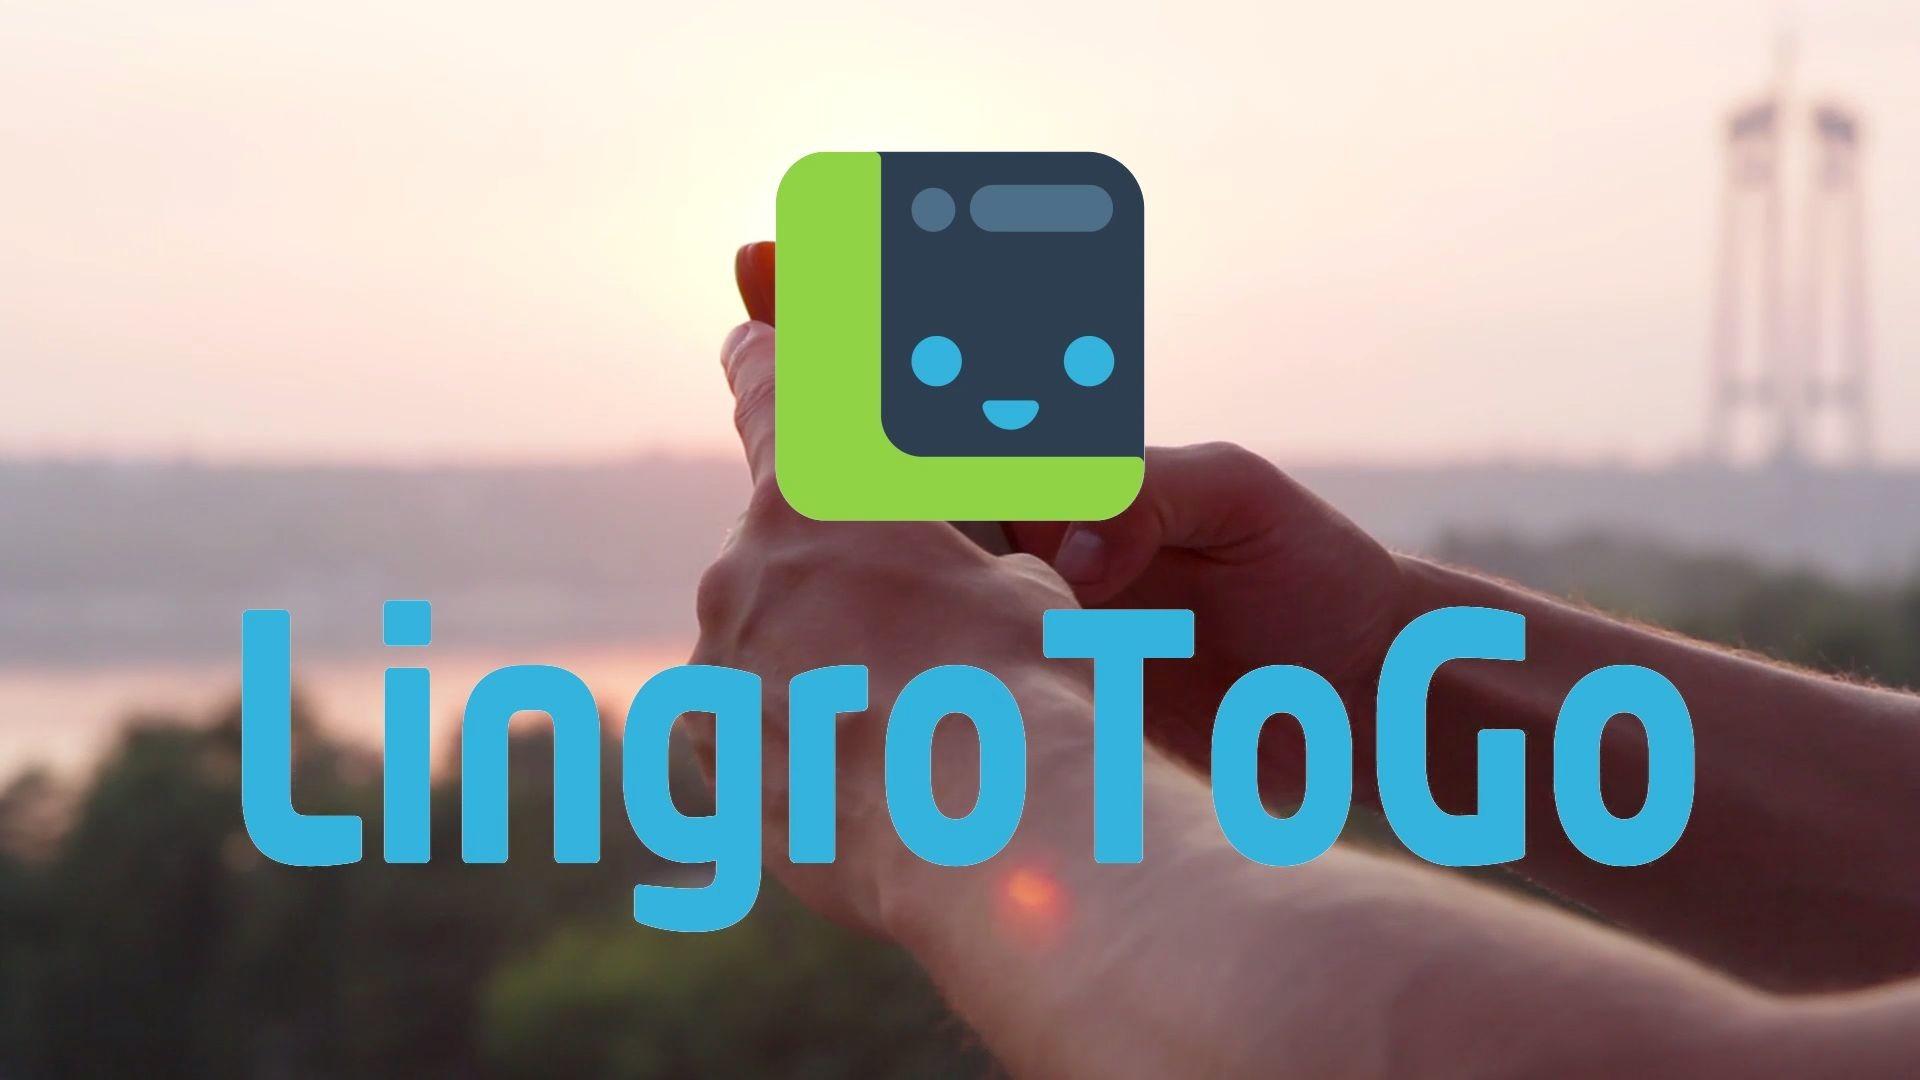 Introducing LingroToGo